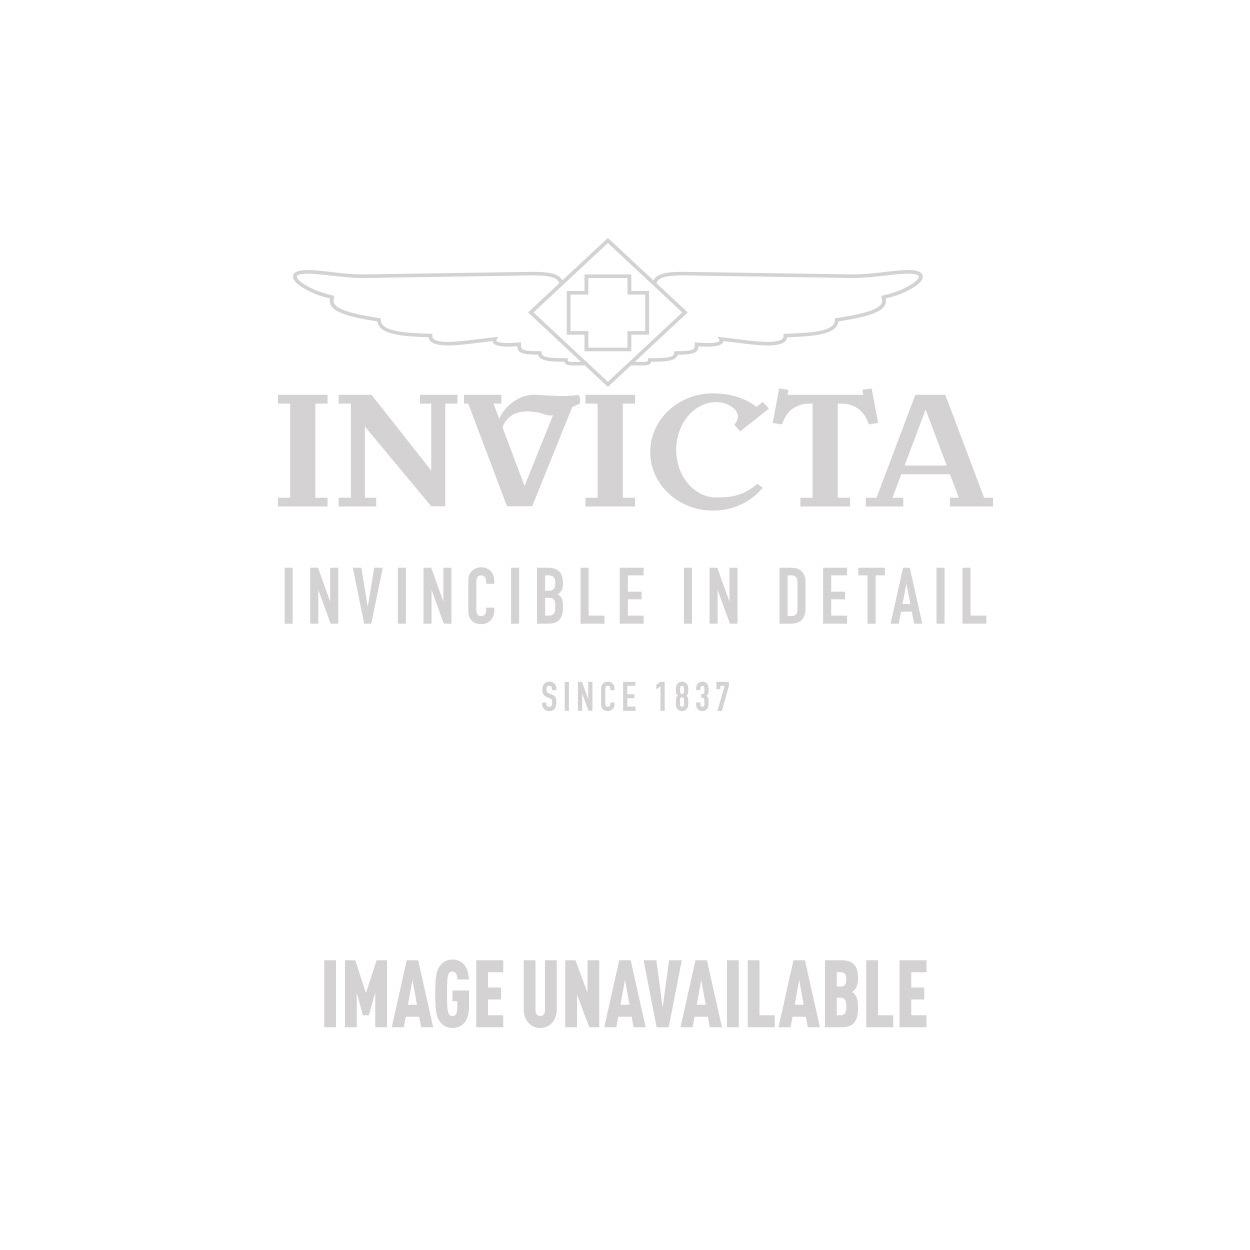 8287b73ff56 Invicta Disney Limited Edition Mickey Mouse Mens Quartz 48mm Black Case  Black Dial - Model 26743 - Official Invicta Store